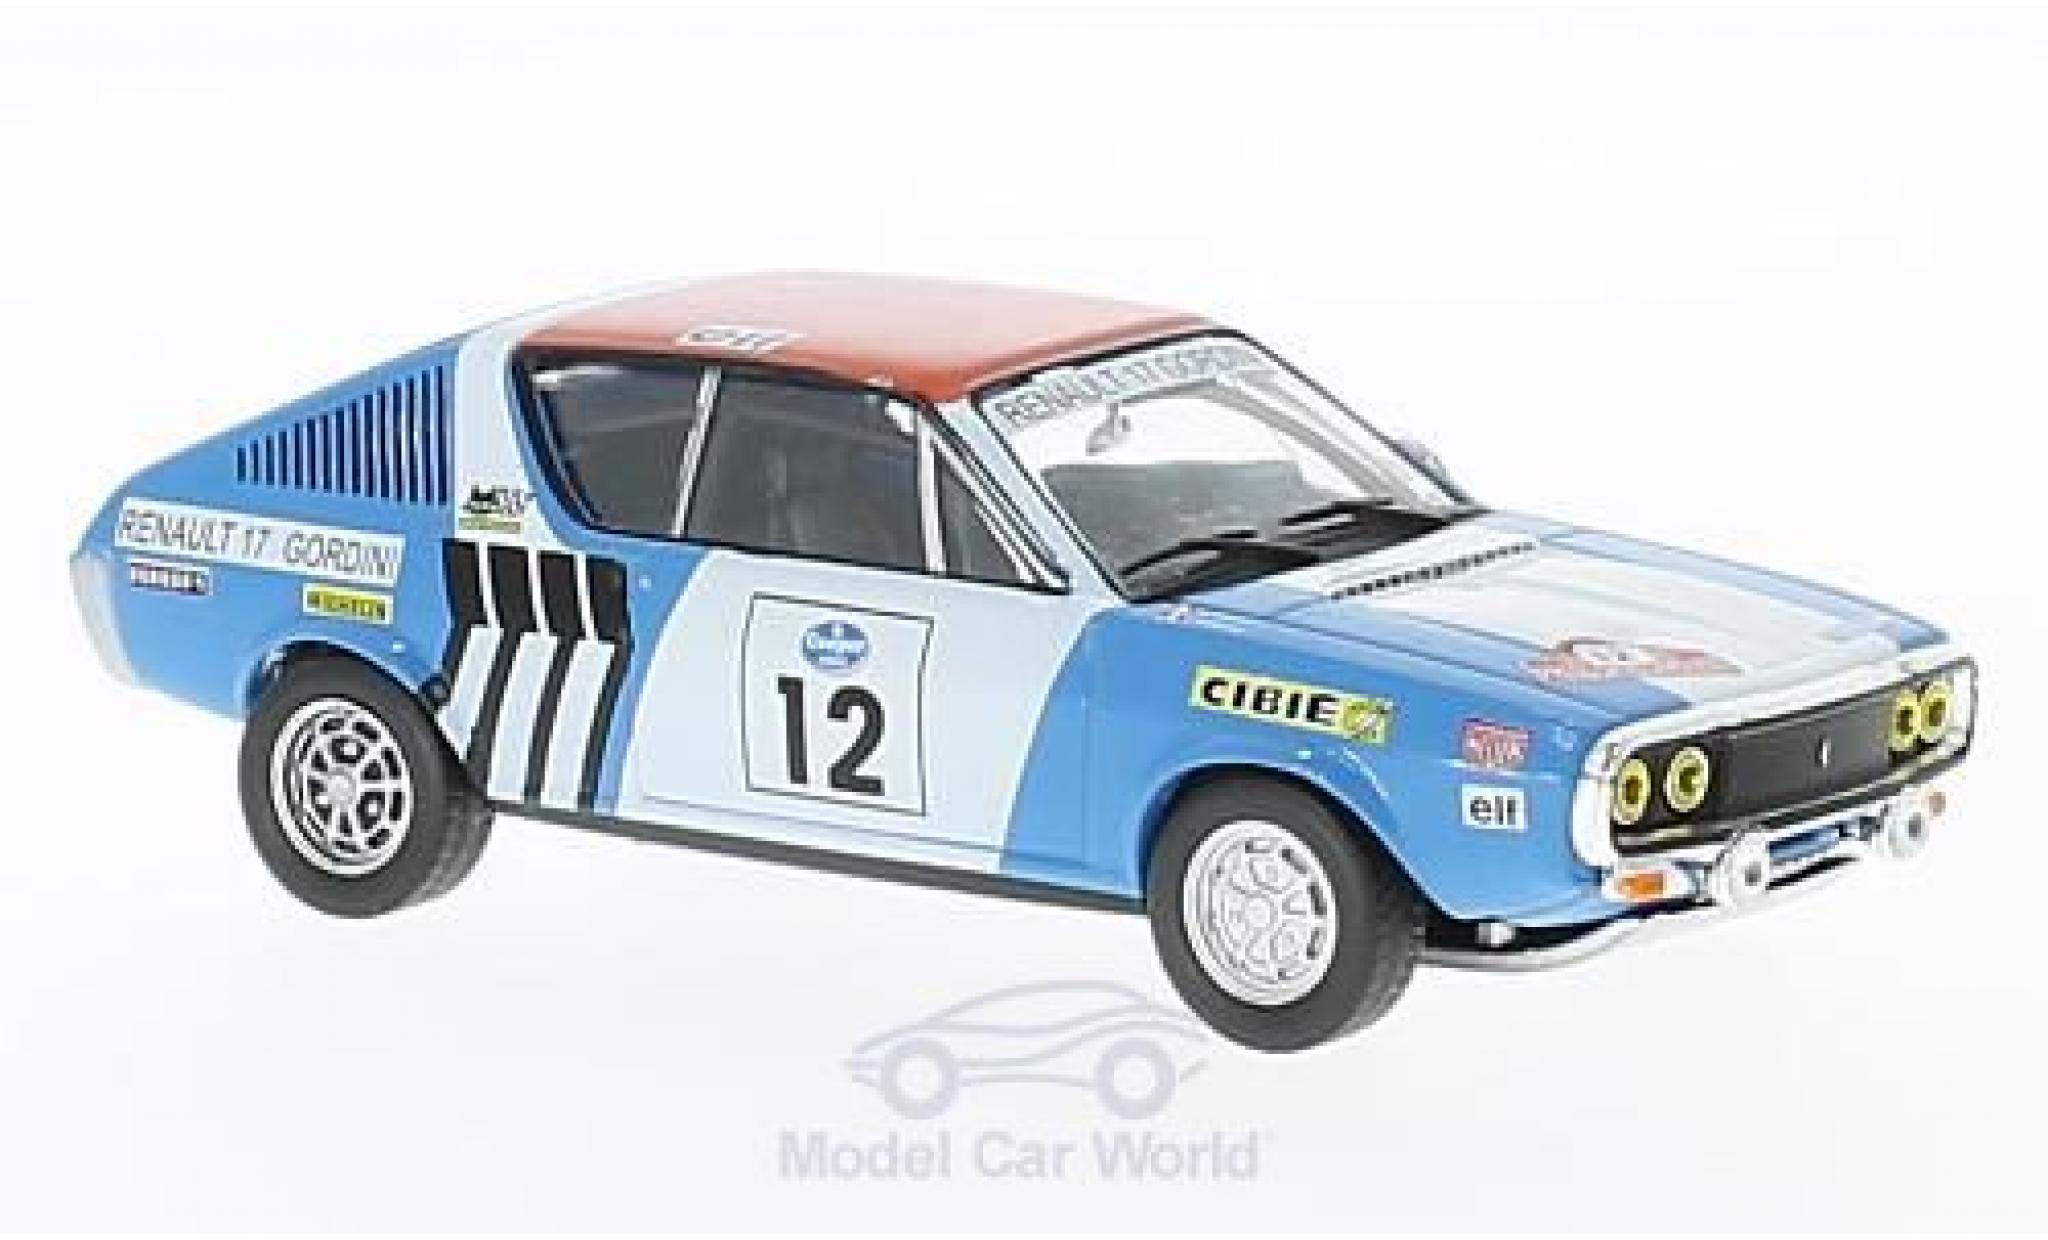 Renault 17 1/43 SpecialC 94 Gordini No.12 Rallye Press on Regardless 1974 J-L.Therier/C.Delferrier ohne Vitrine